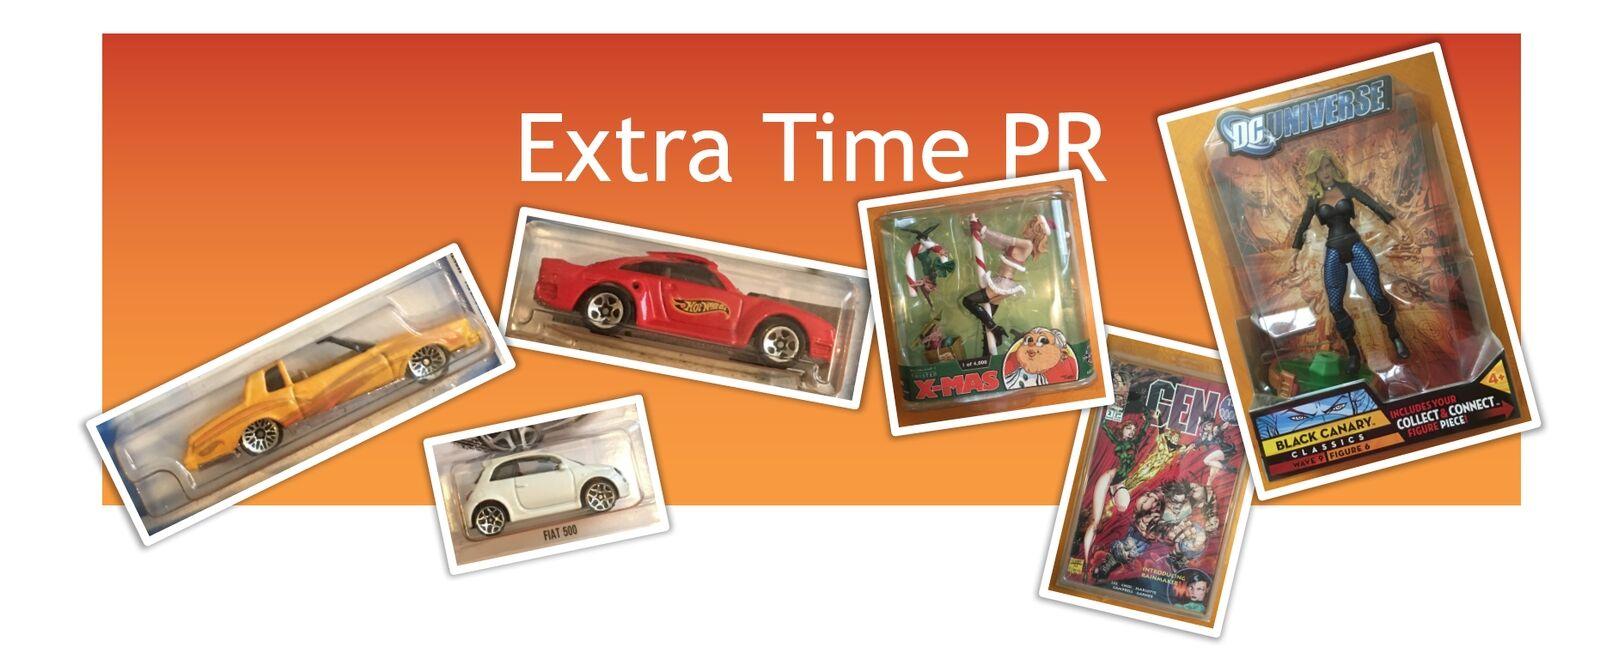 Extra Time PR